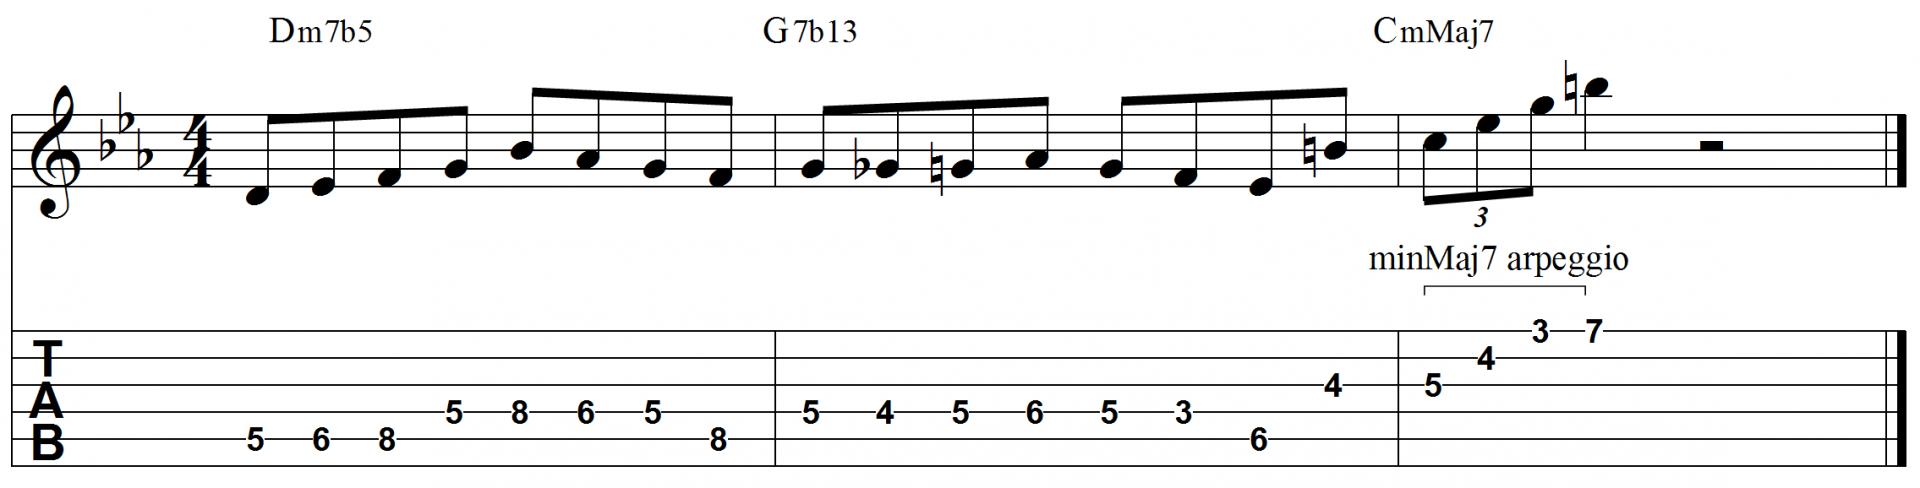 Minor major 7 jazz guitar lick